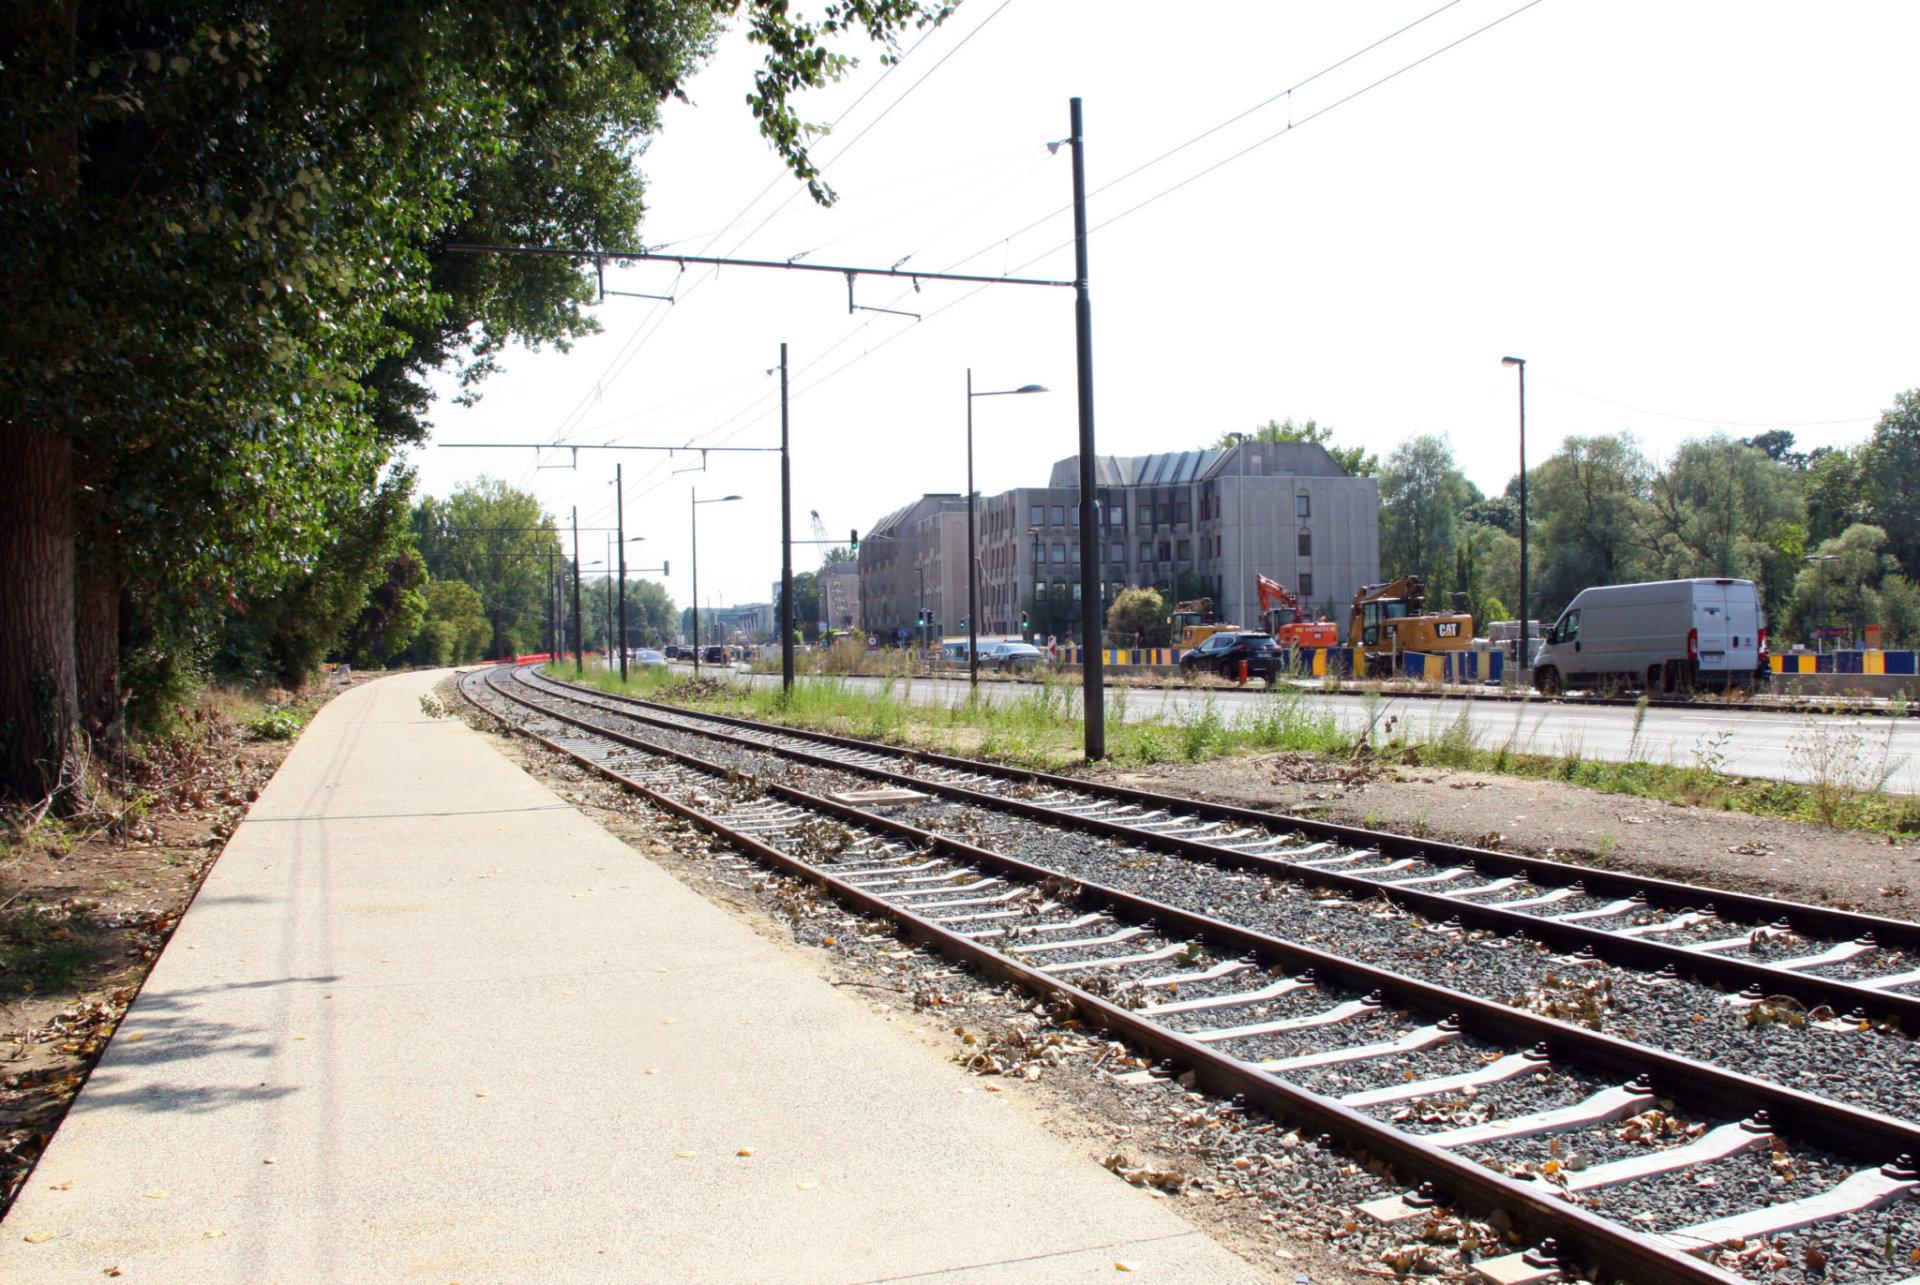 tram94 36